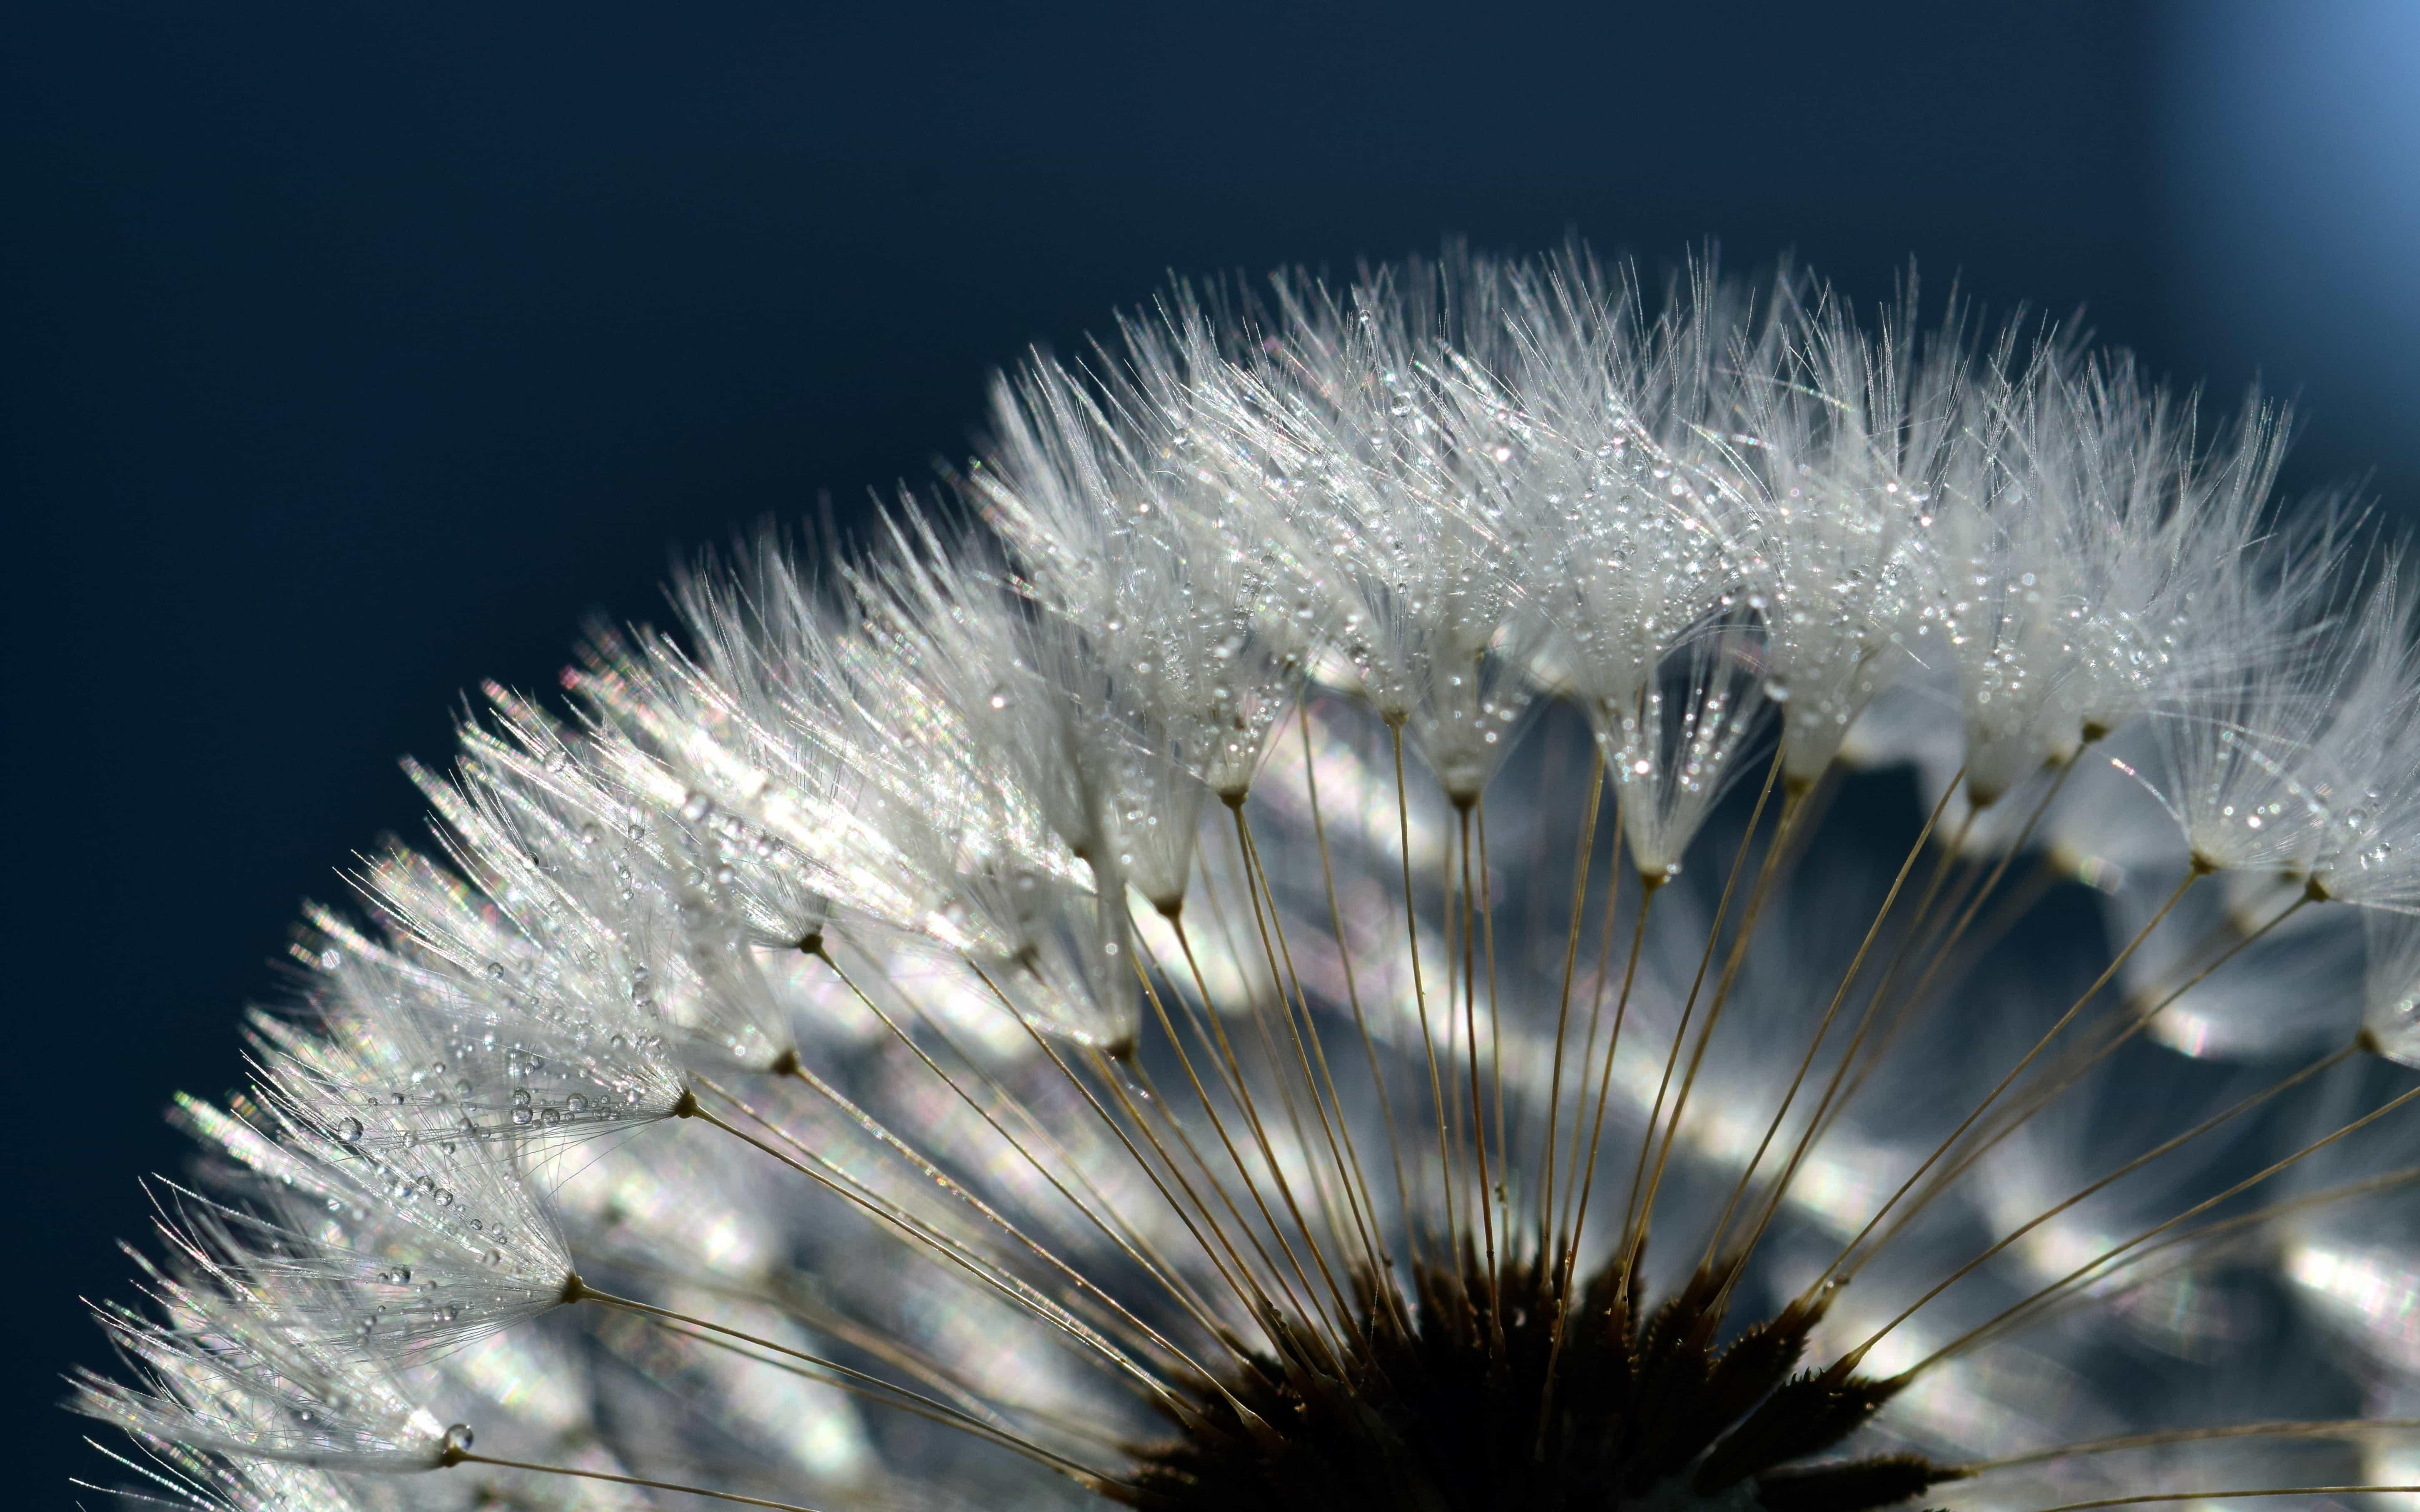 Macro dandelion photo